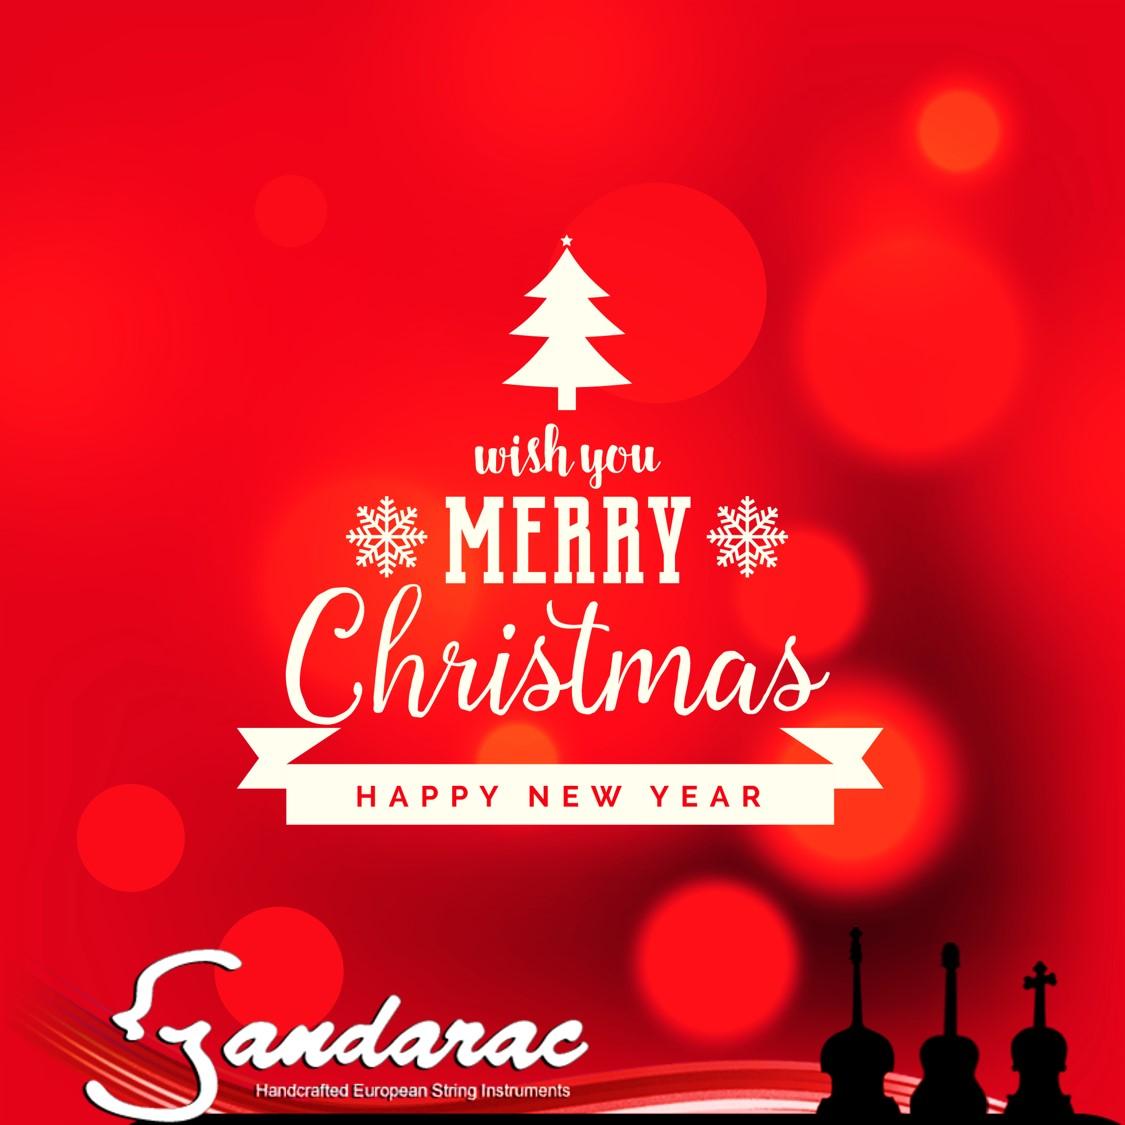 24 - merry christmas